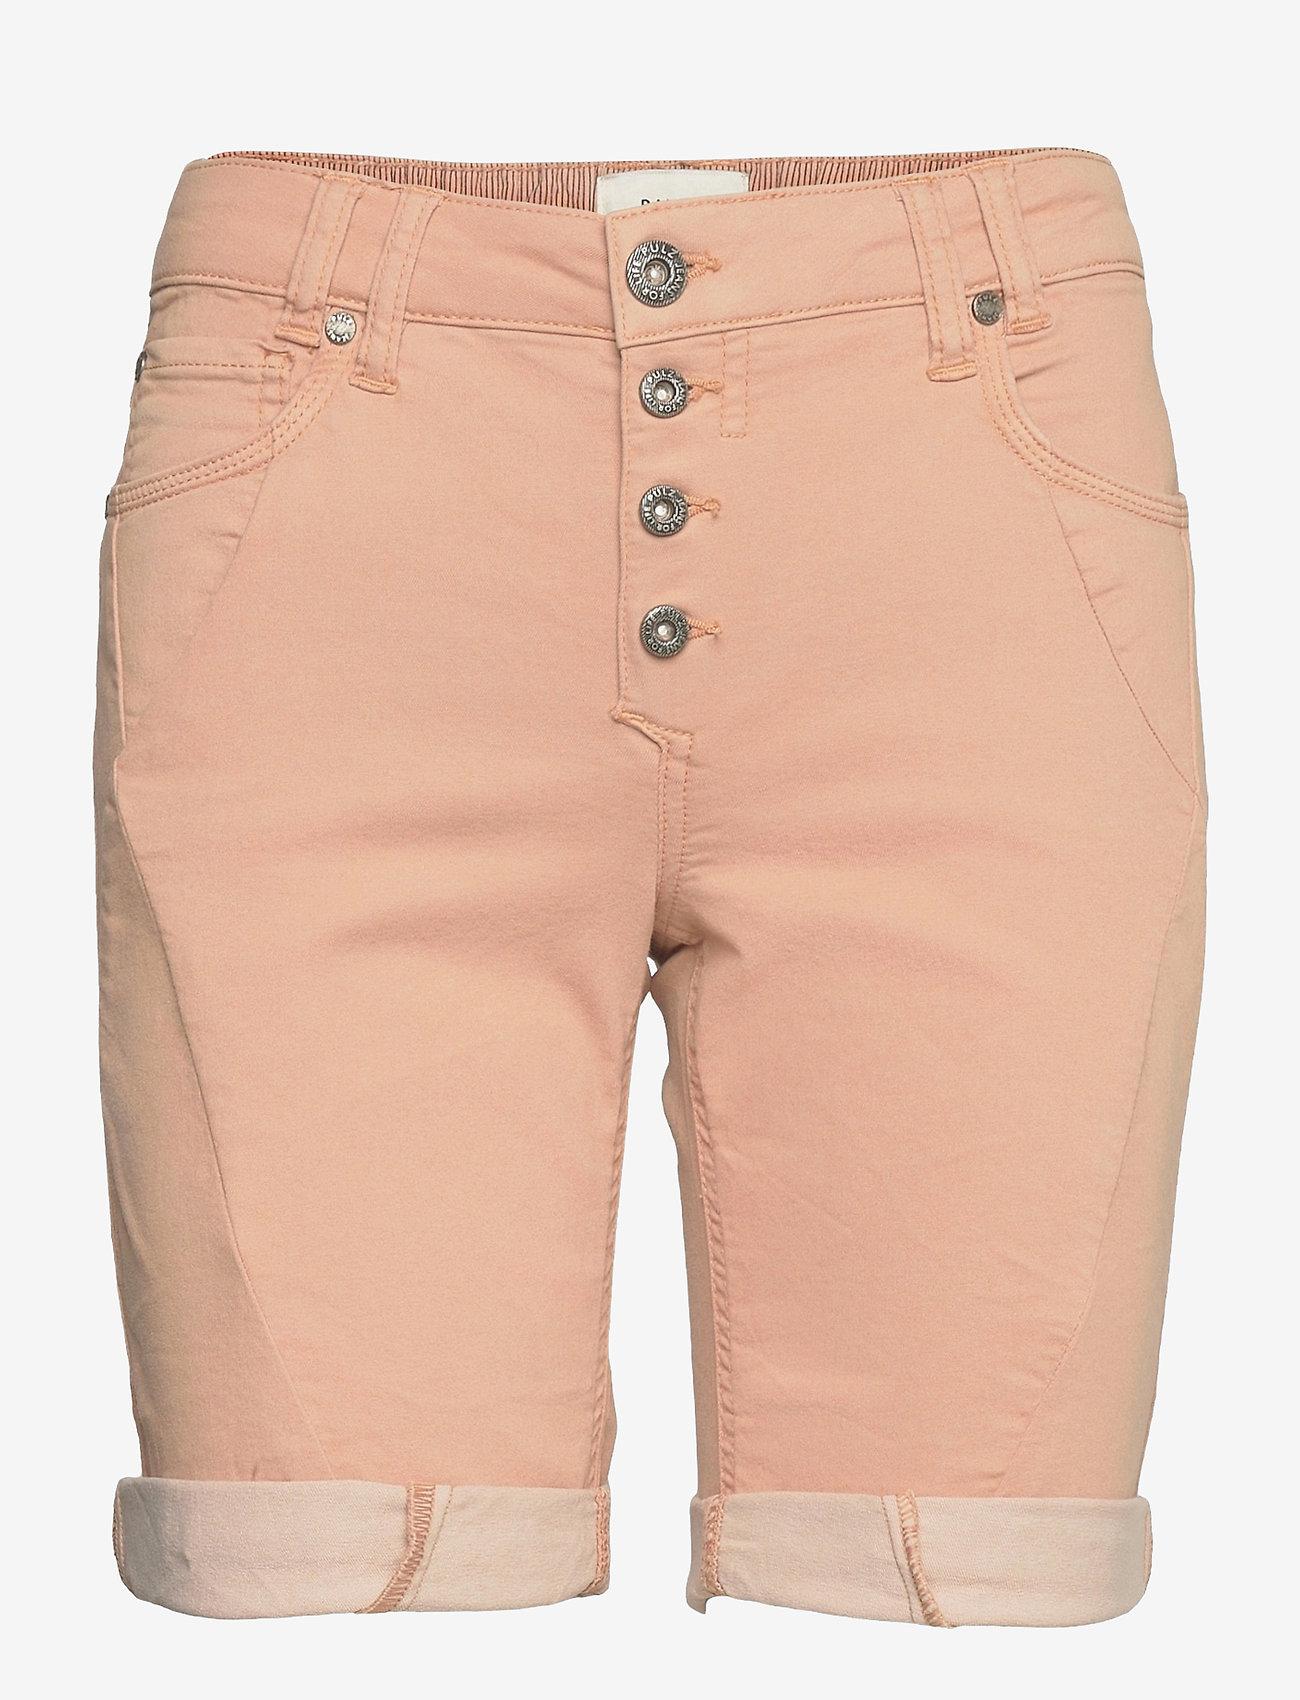 Pulz Jeans - PZROSITA Shorts - denimshorts - mahogany rose - 0